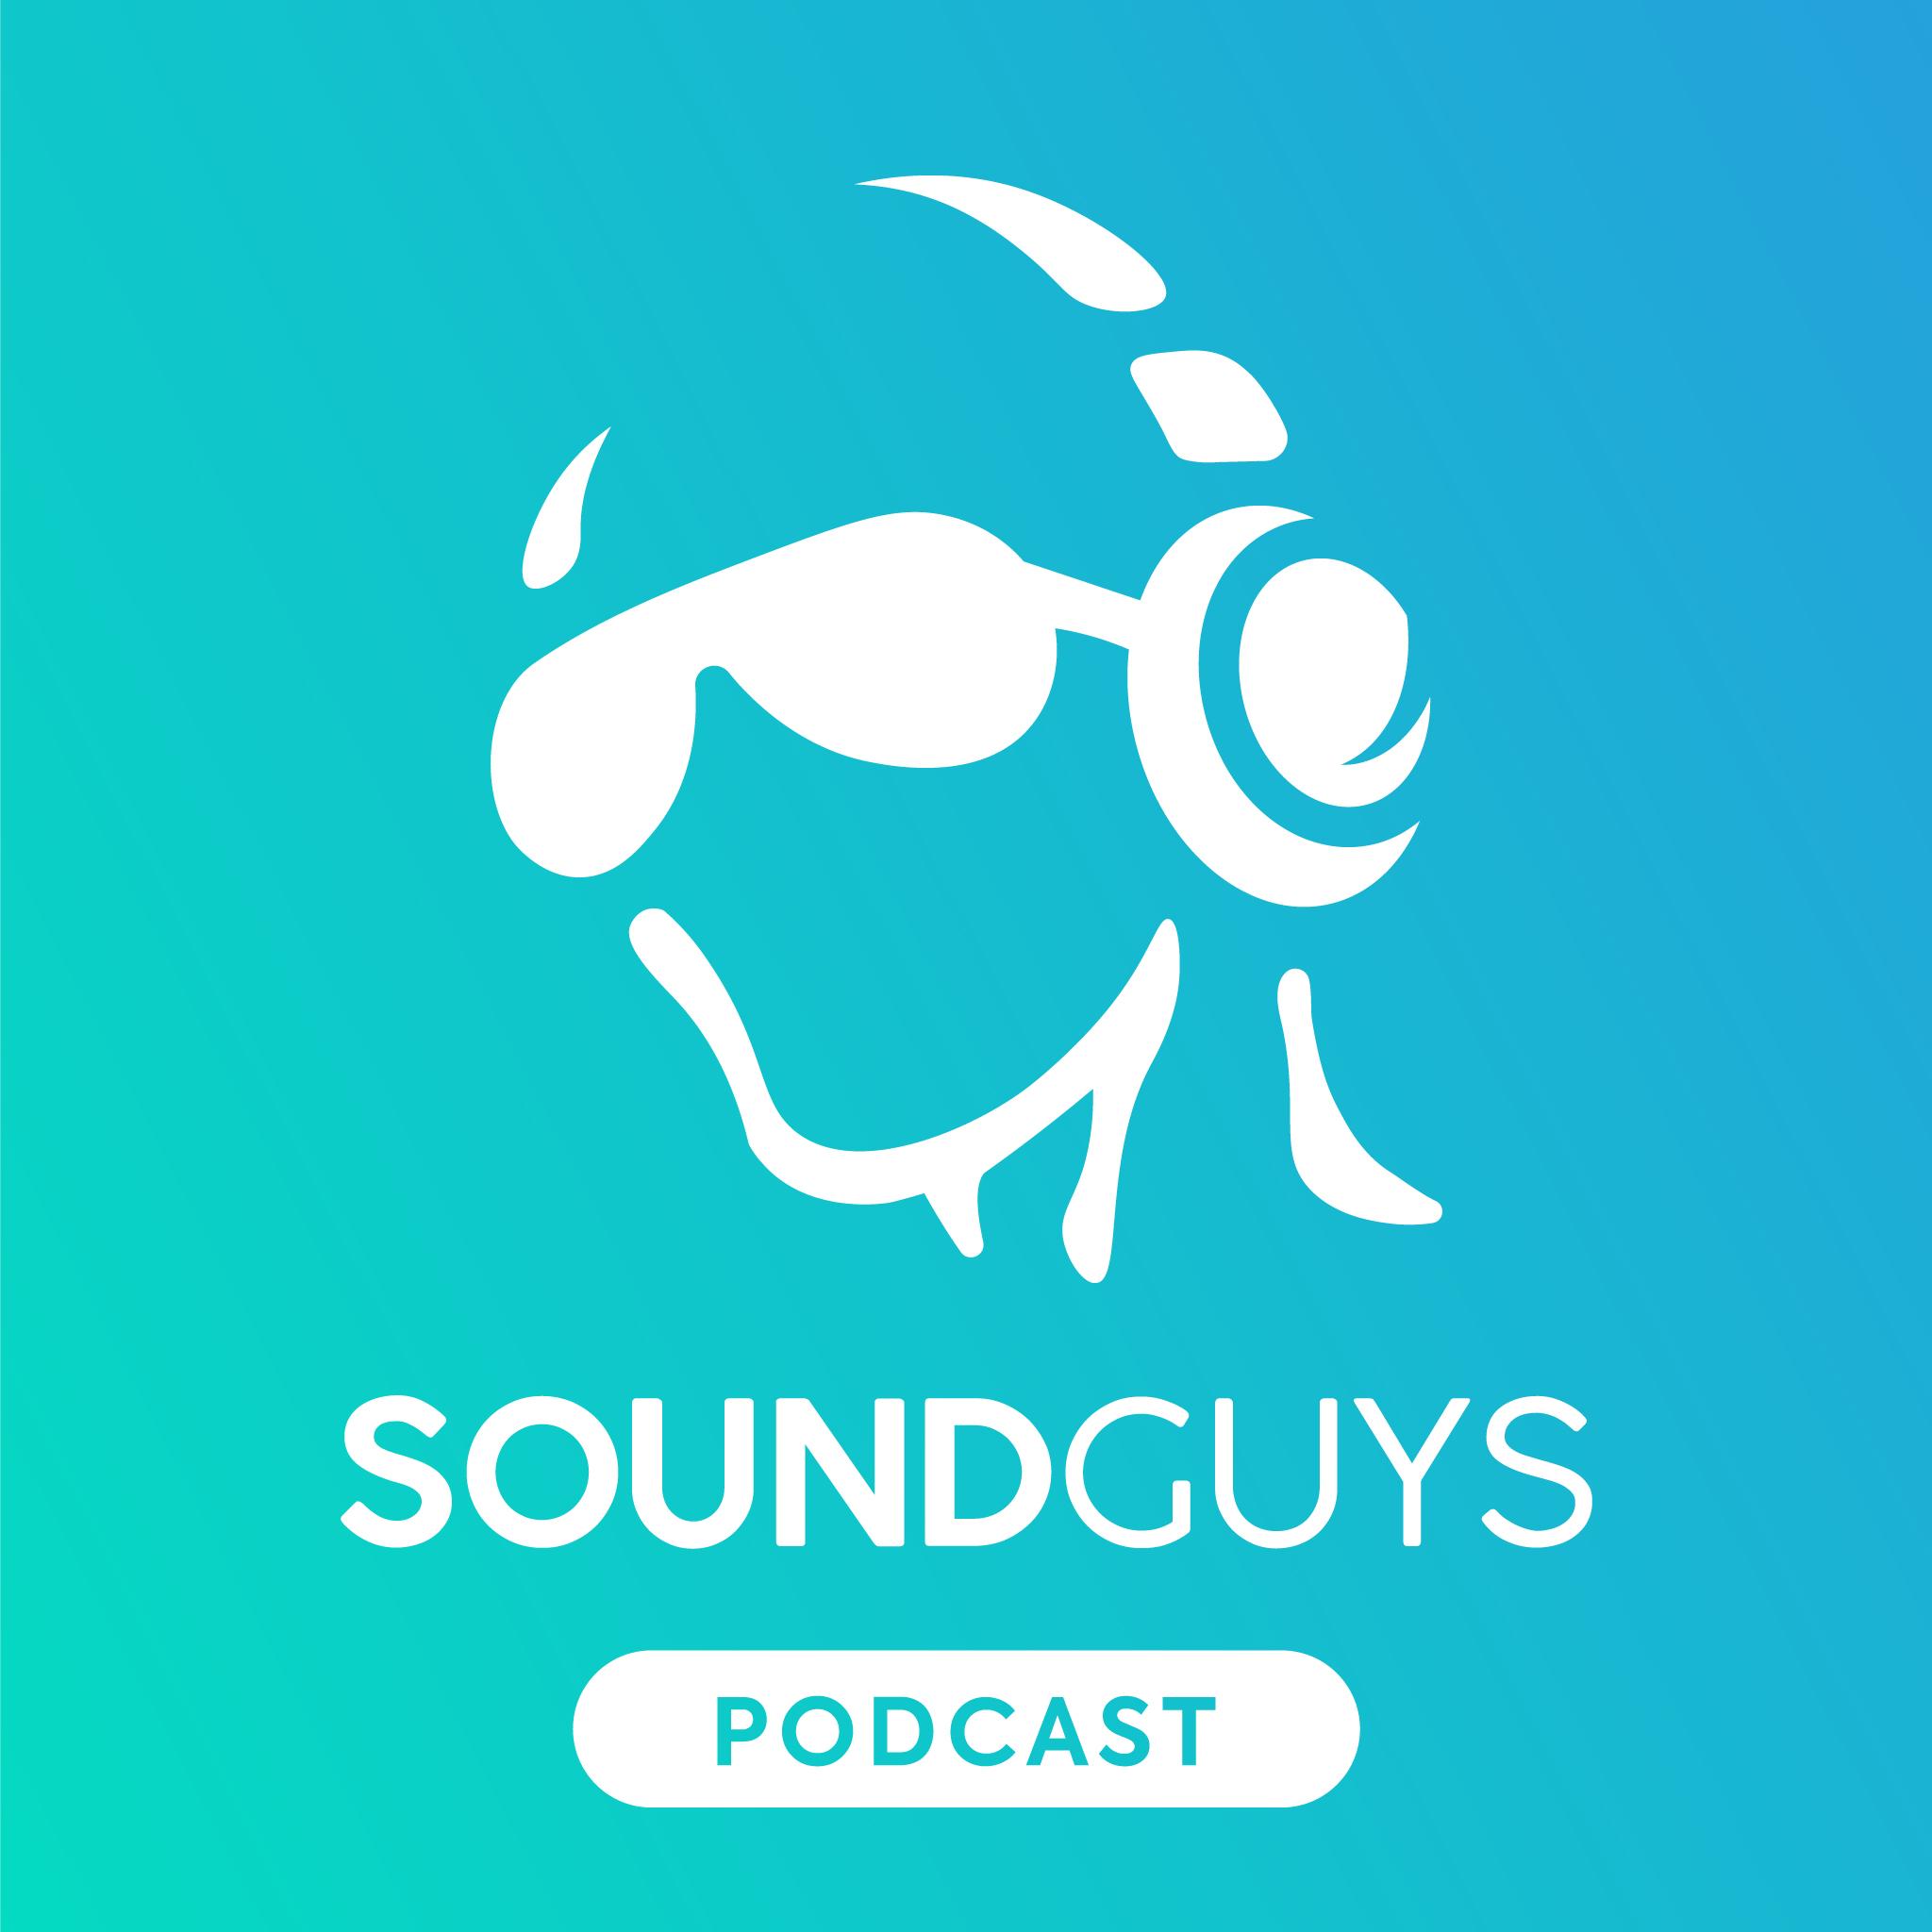 Podcast: The MP3 Revolution - SoundGuys